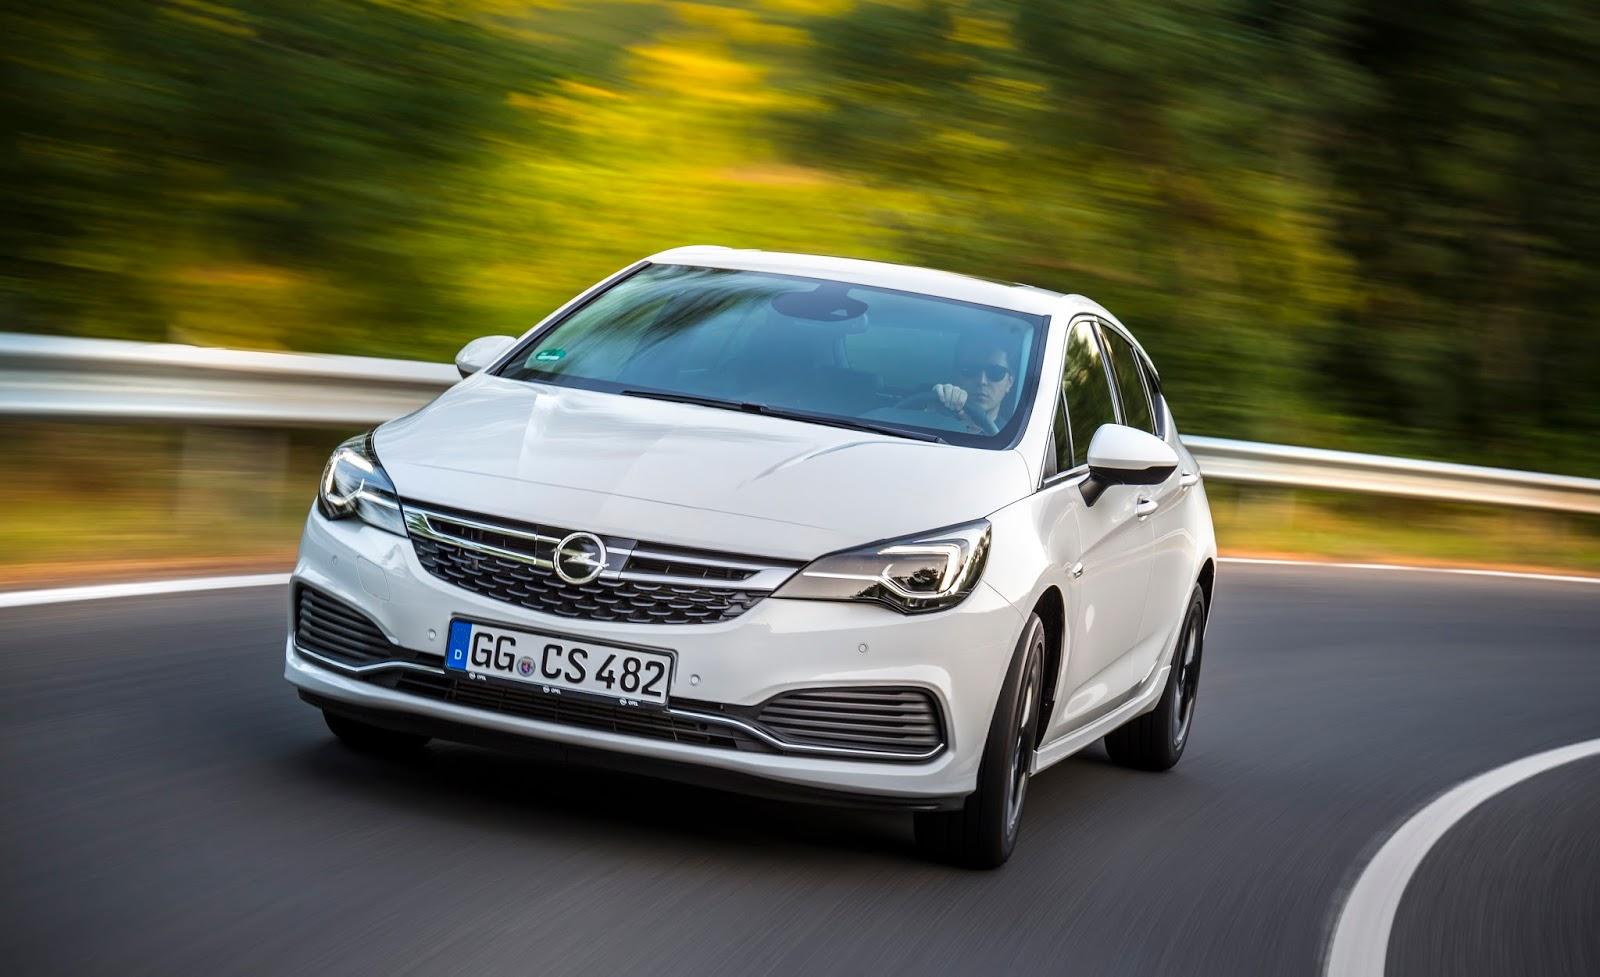 Opel Astra 299519 1 Το Opel Astra με σπορ εμφάνιση από το κορυφαίο OPC